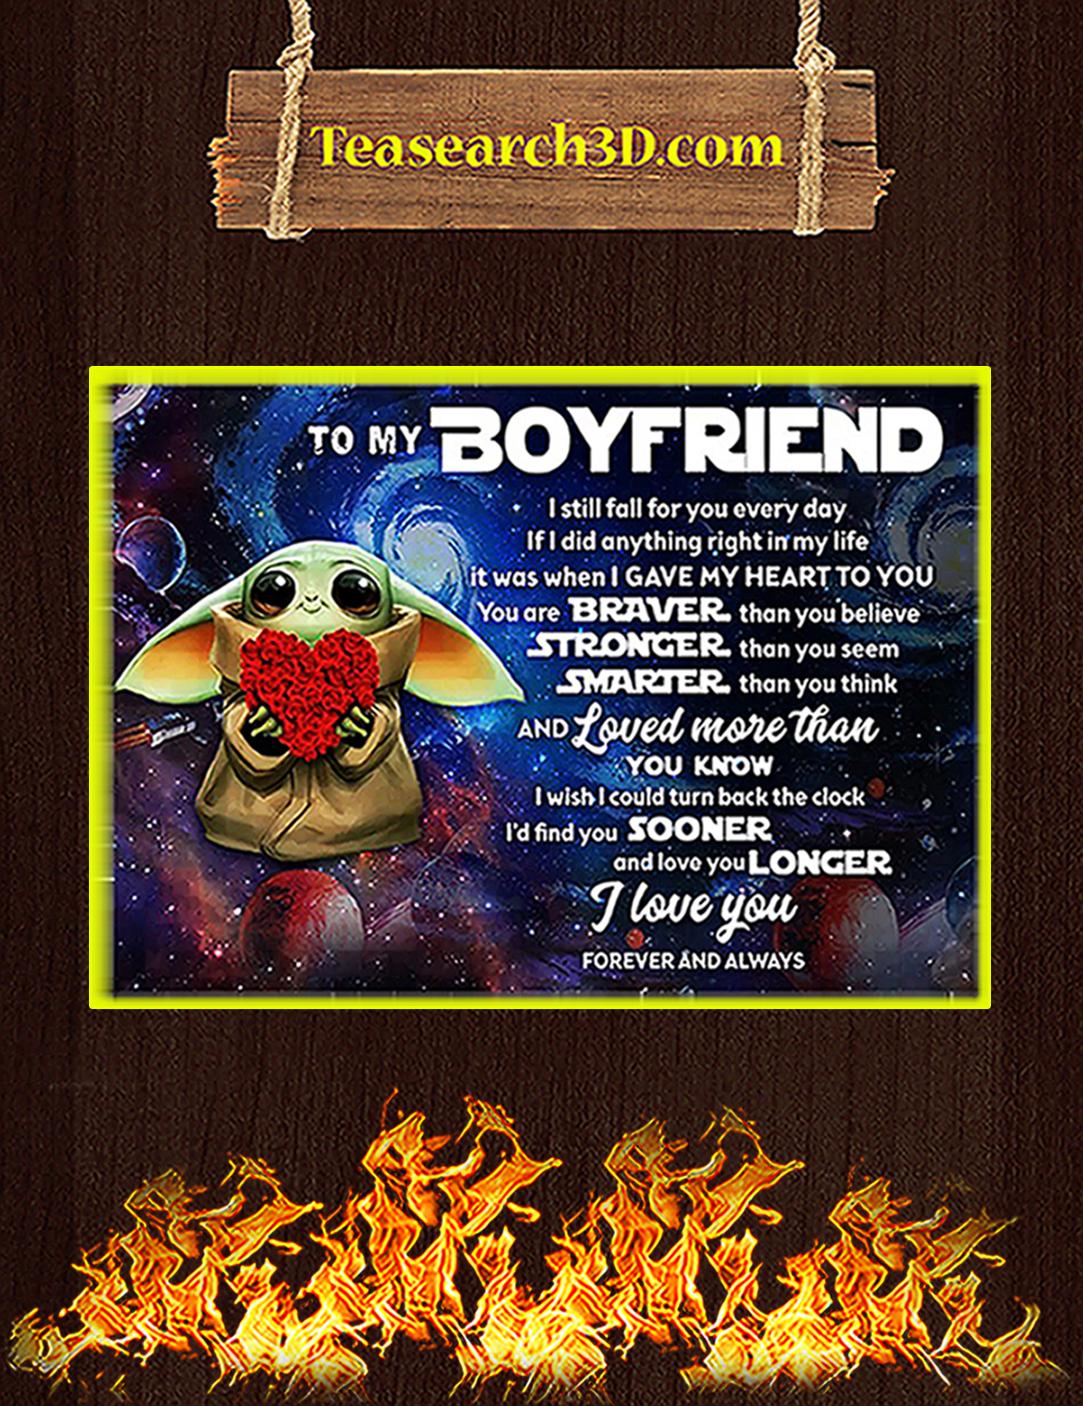 Baby yoda to my boyfriend poster A2